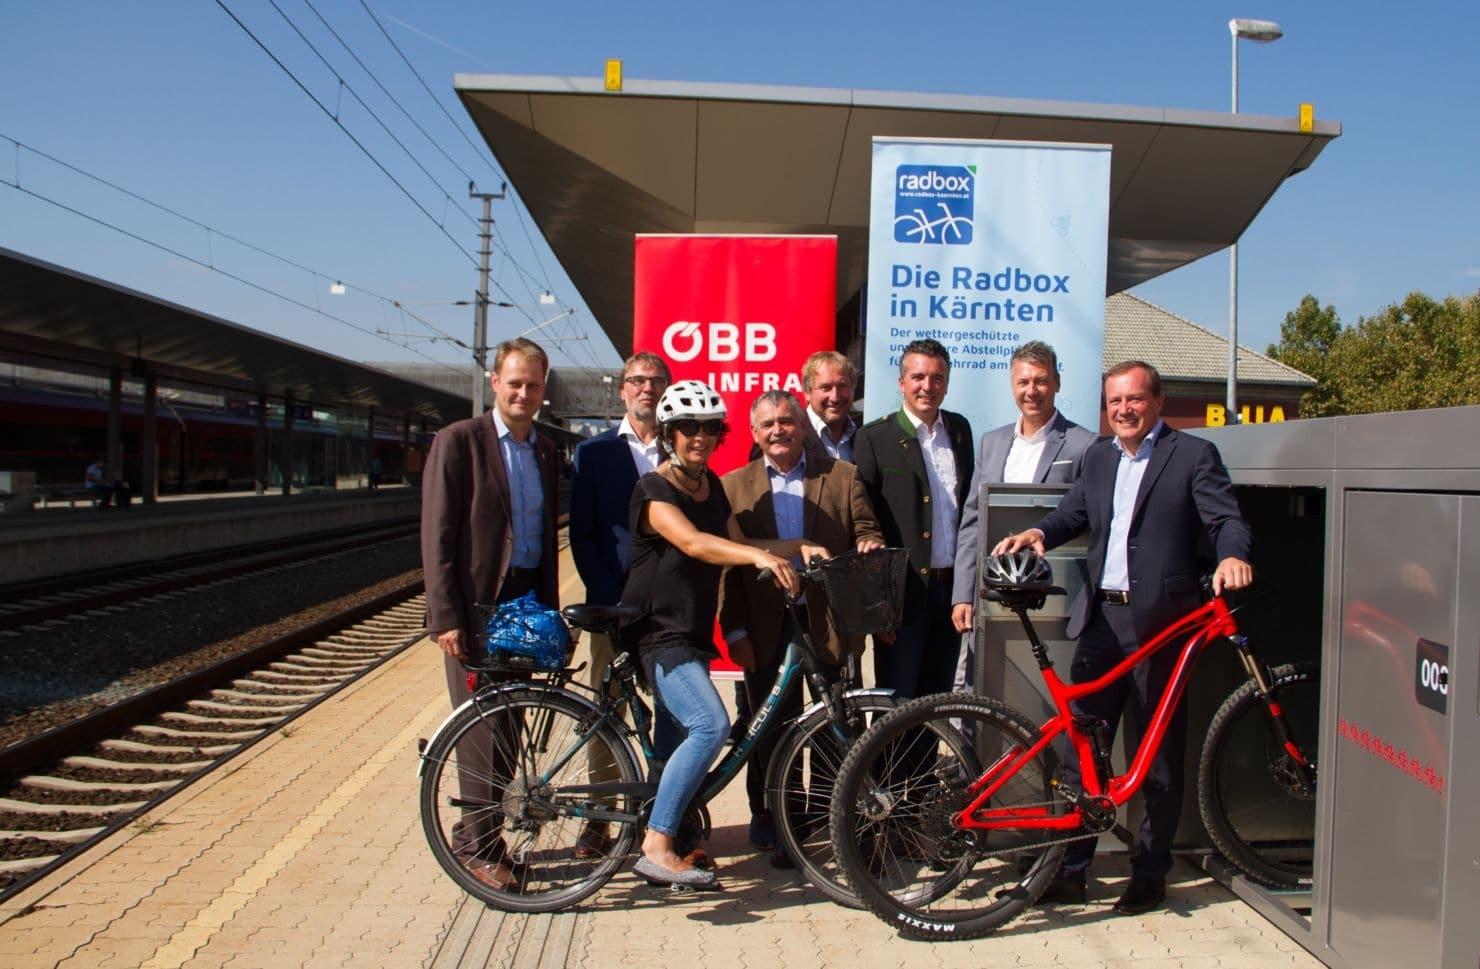 Neue Fahrradboxen für Kärnten in Kärnten 5 Minuten